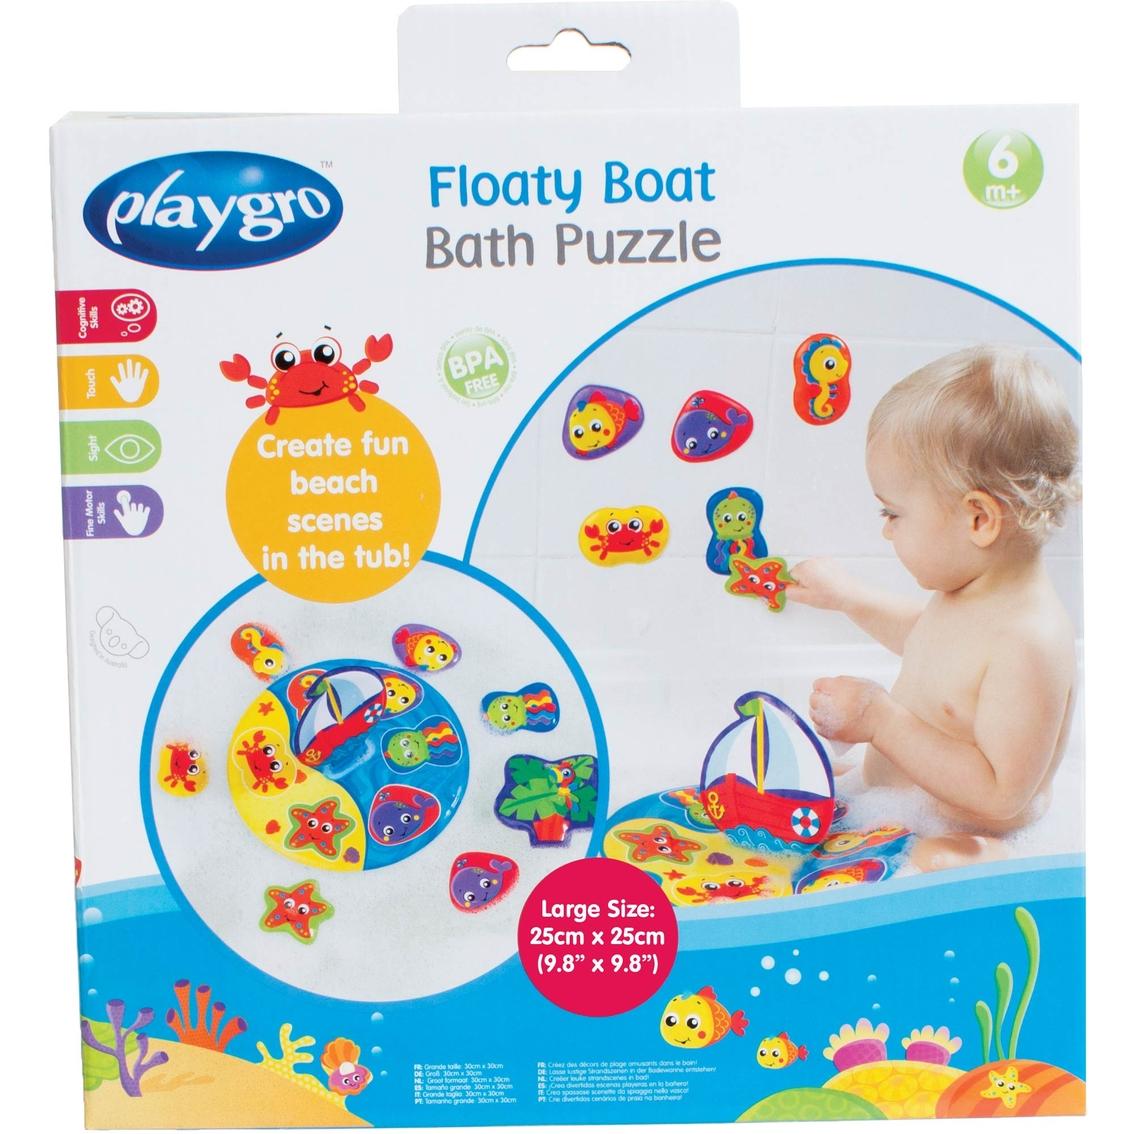 Playgro Floaty Boat Bath Puzzle   Bath Toys   Baby & Toys   Shop The ...